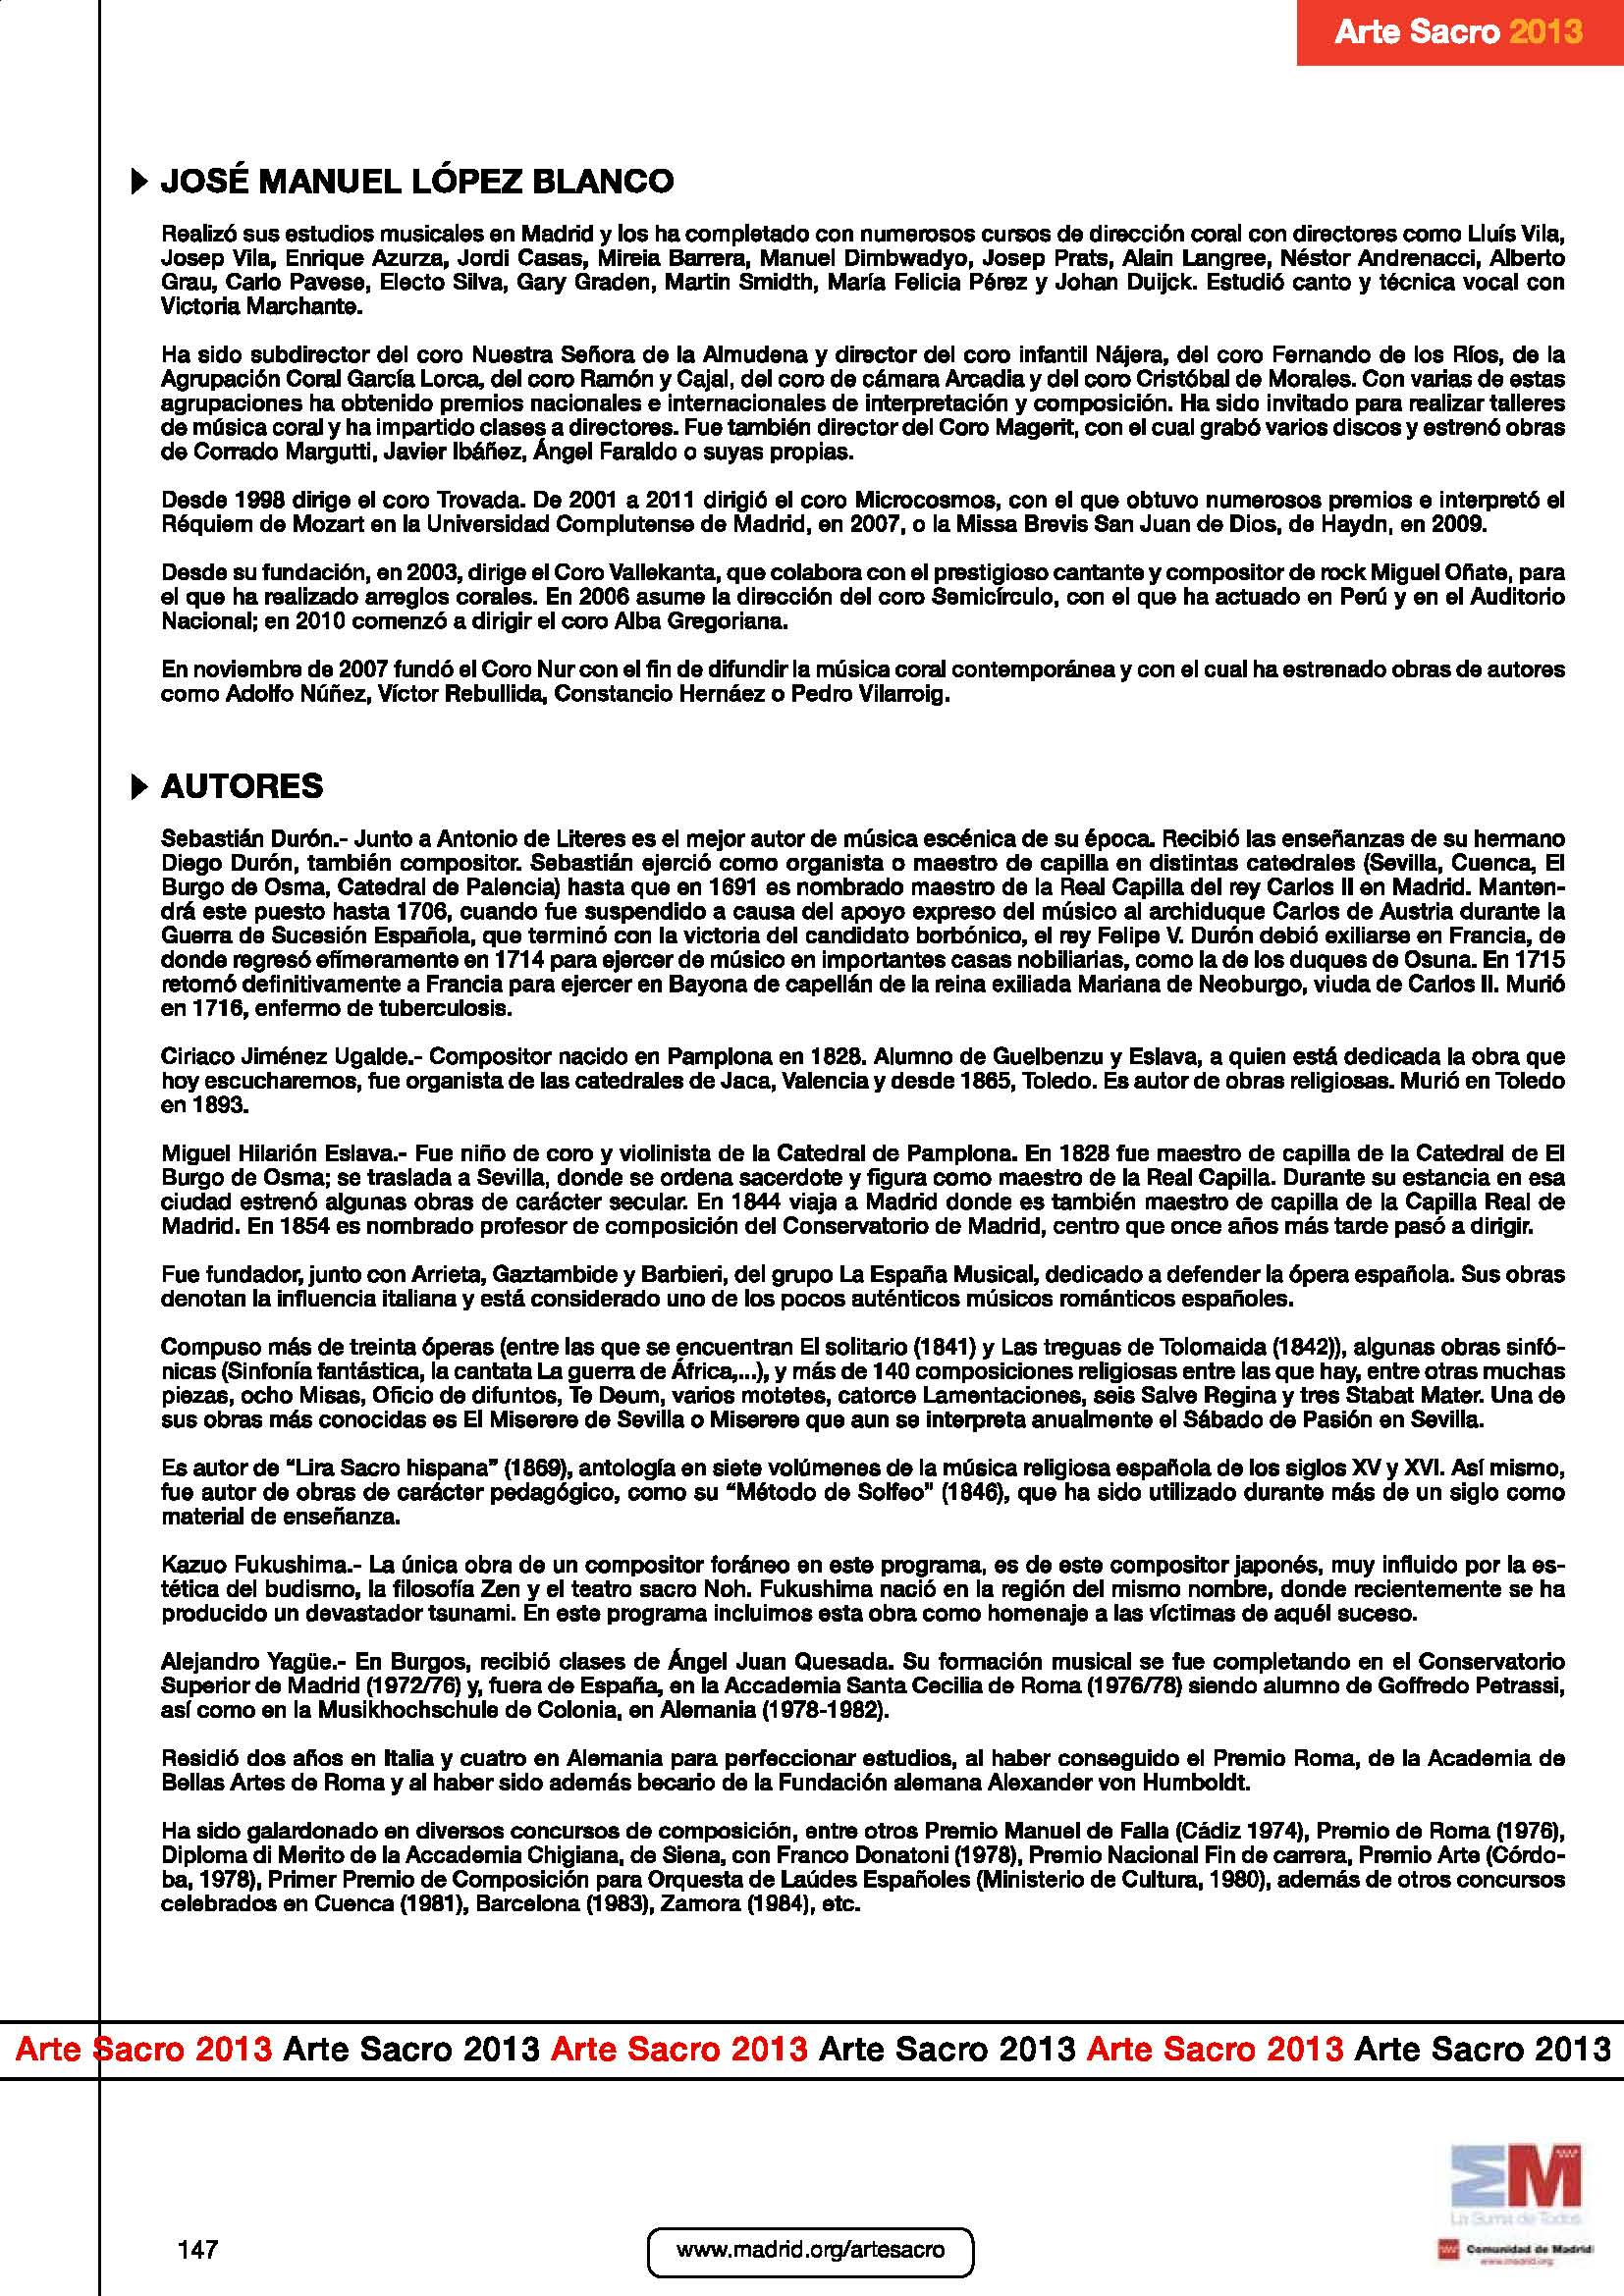 dossier_completo_Página_147